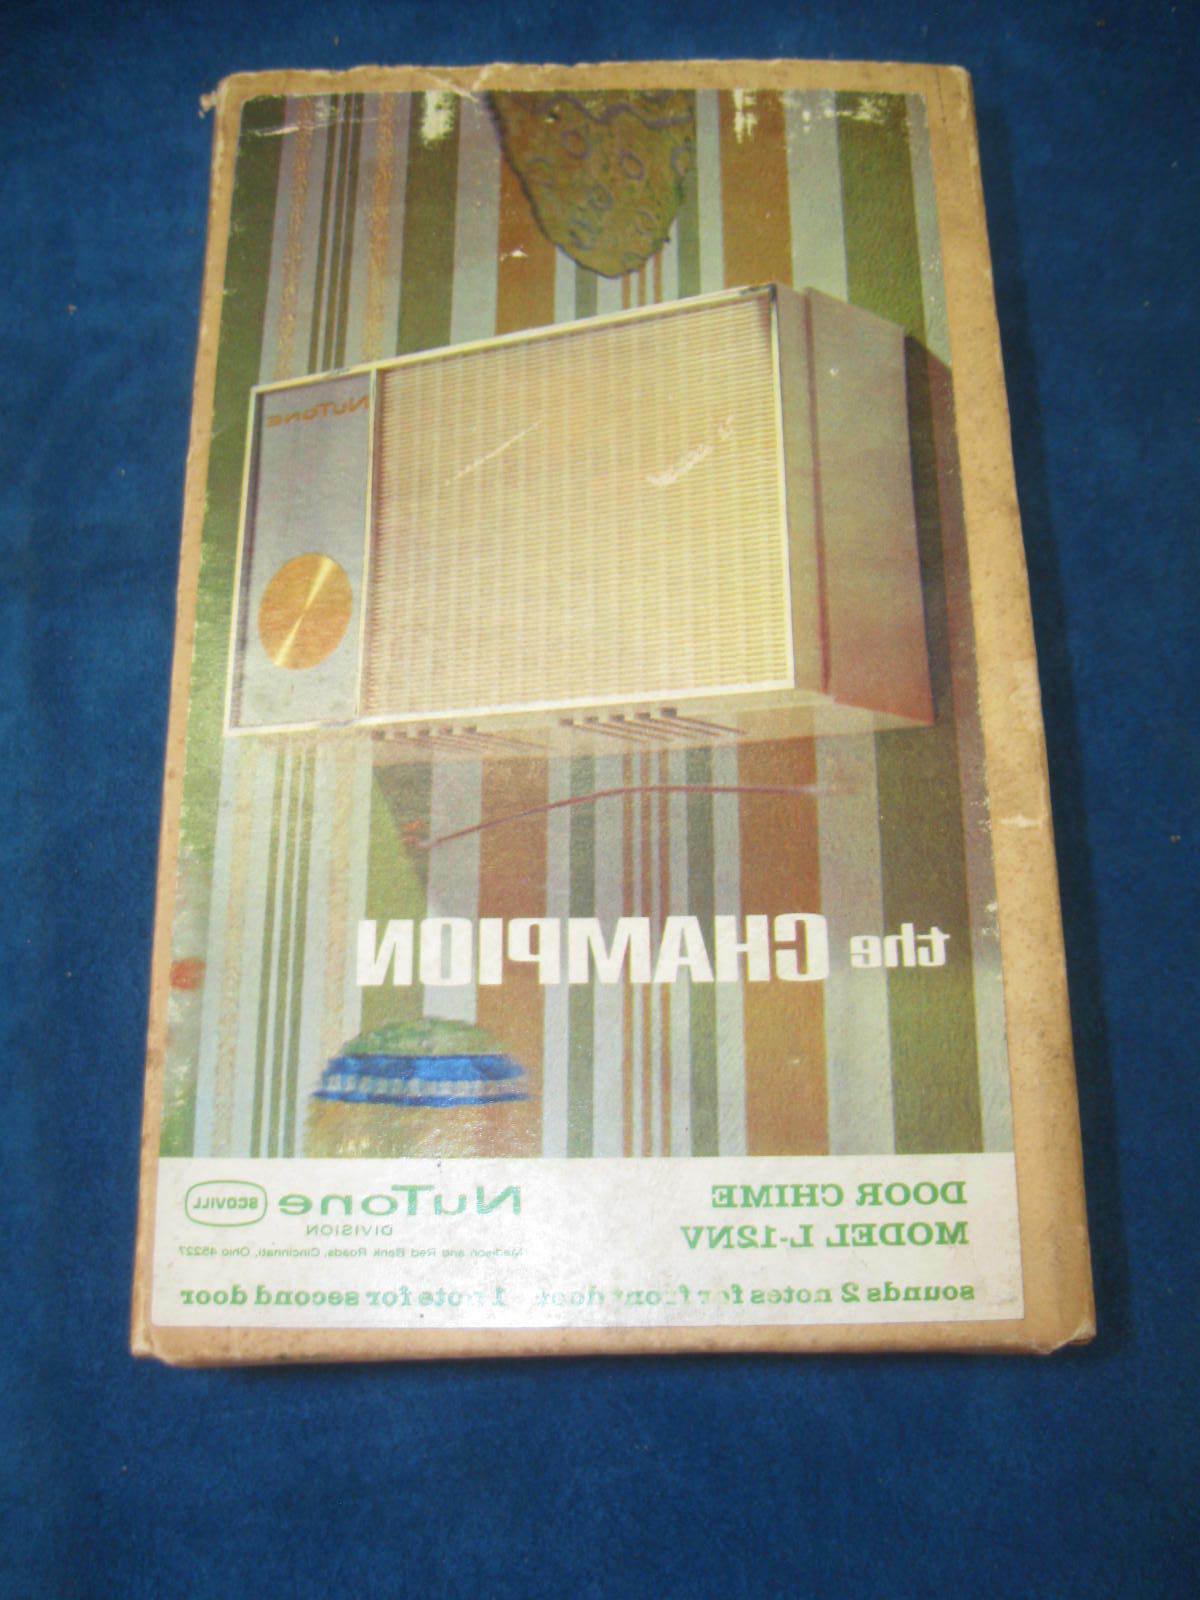 "Vintage DOOR Champion"" L-12NV Complete '60's"